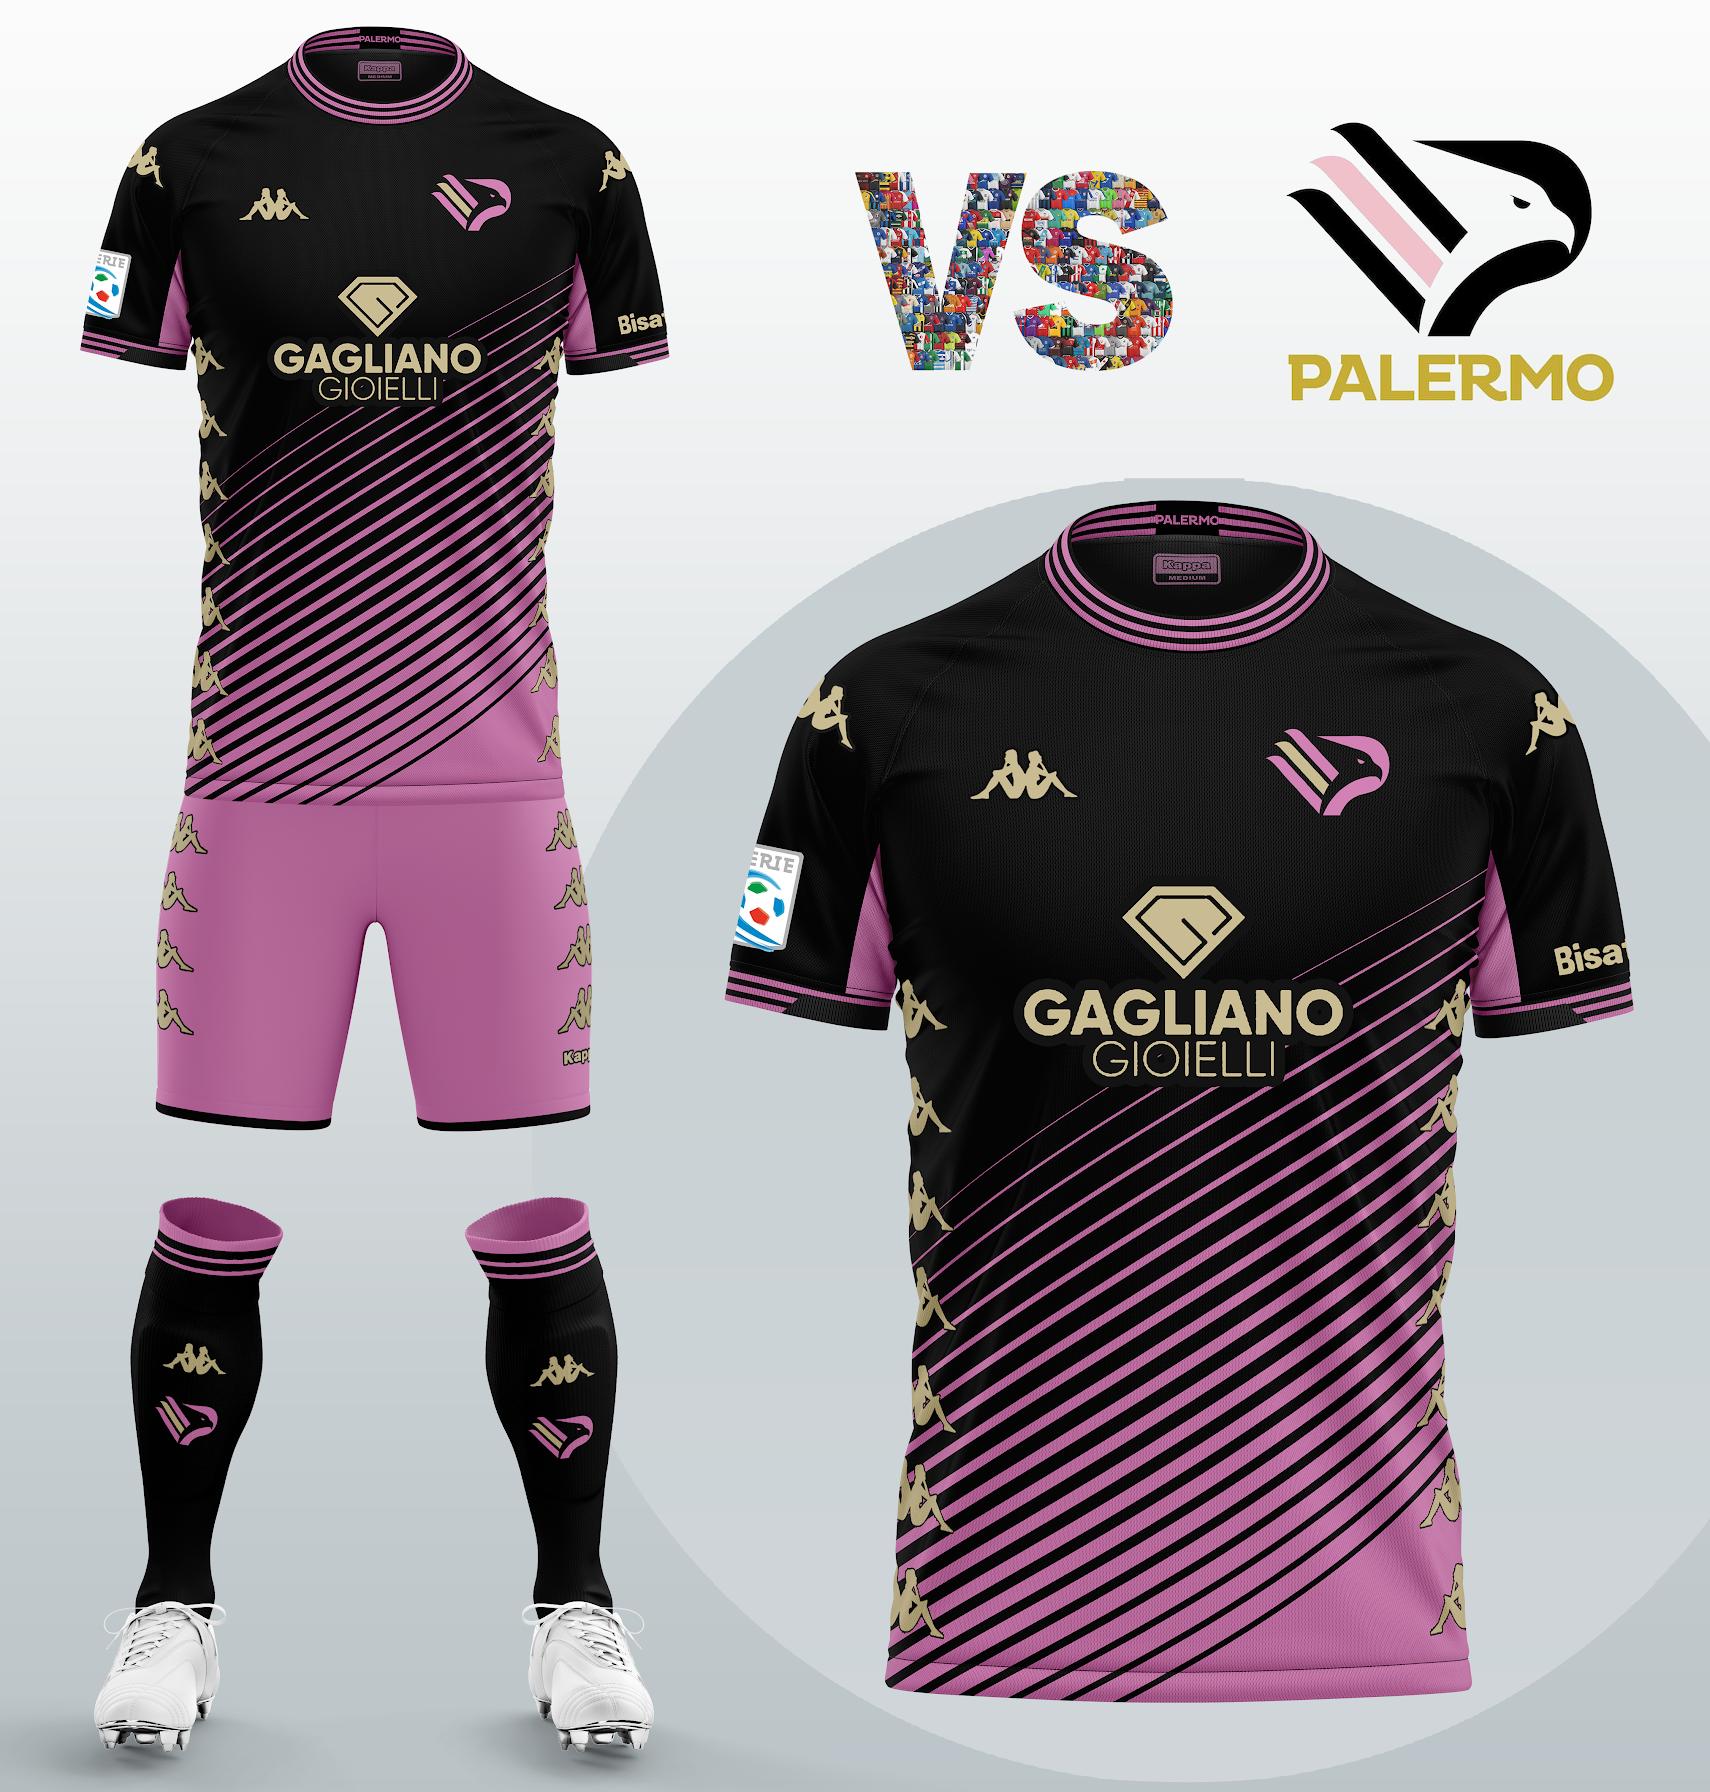 https://www.designfootball.com/images/joomgallery/originals/football_kits_120/ssd_palermo_away_kit_with_kappa_fantasy_2020_2021_20200514_1671944364.png